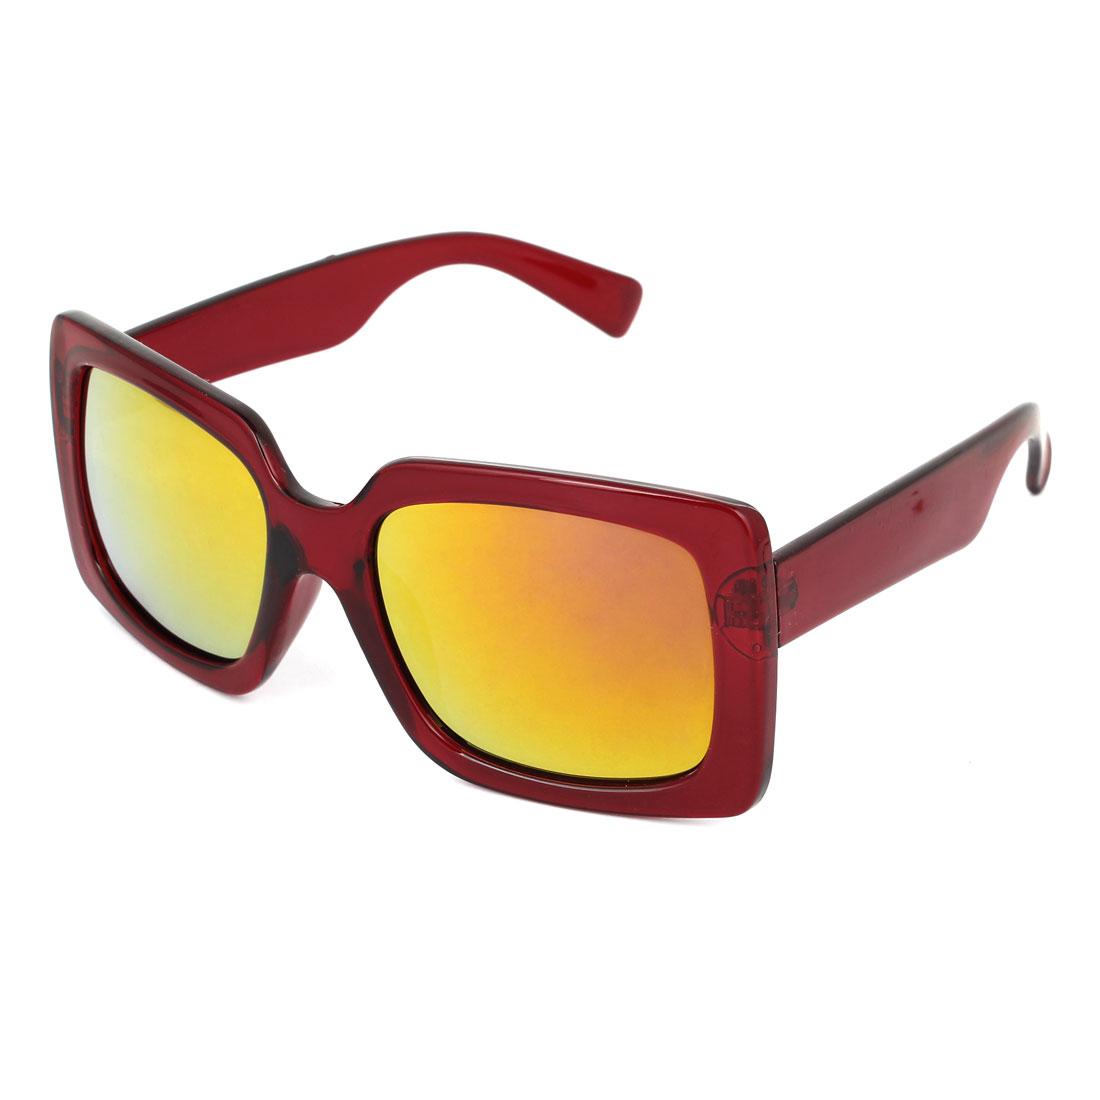 Single Bridge Wide Temple Burgundy Square Shape Full Rim Frame Yellow Mirror Lens Beach Traveling Shopping Leisure Eyeglasses Sun Glasses